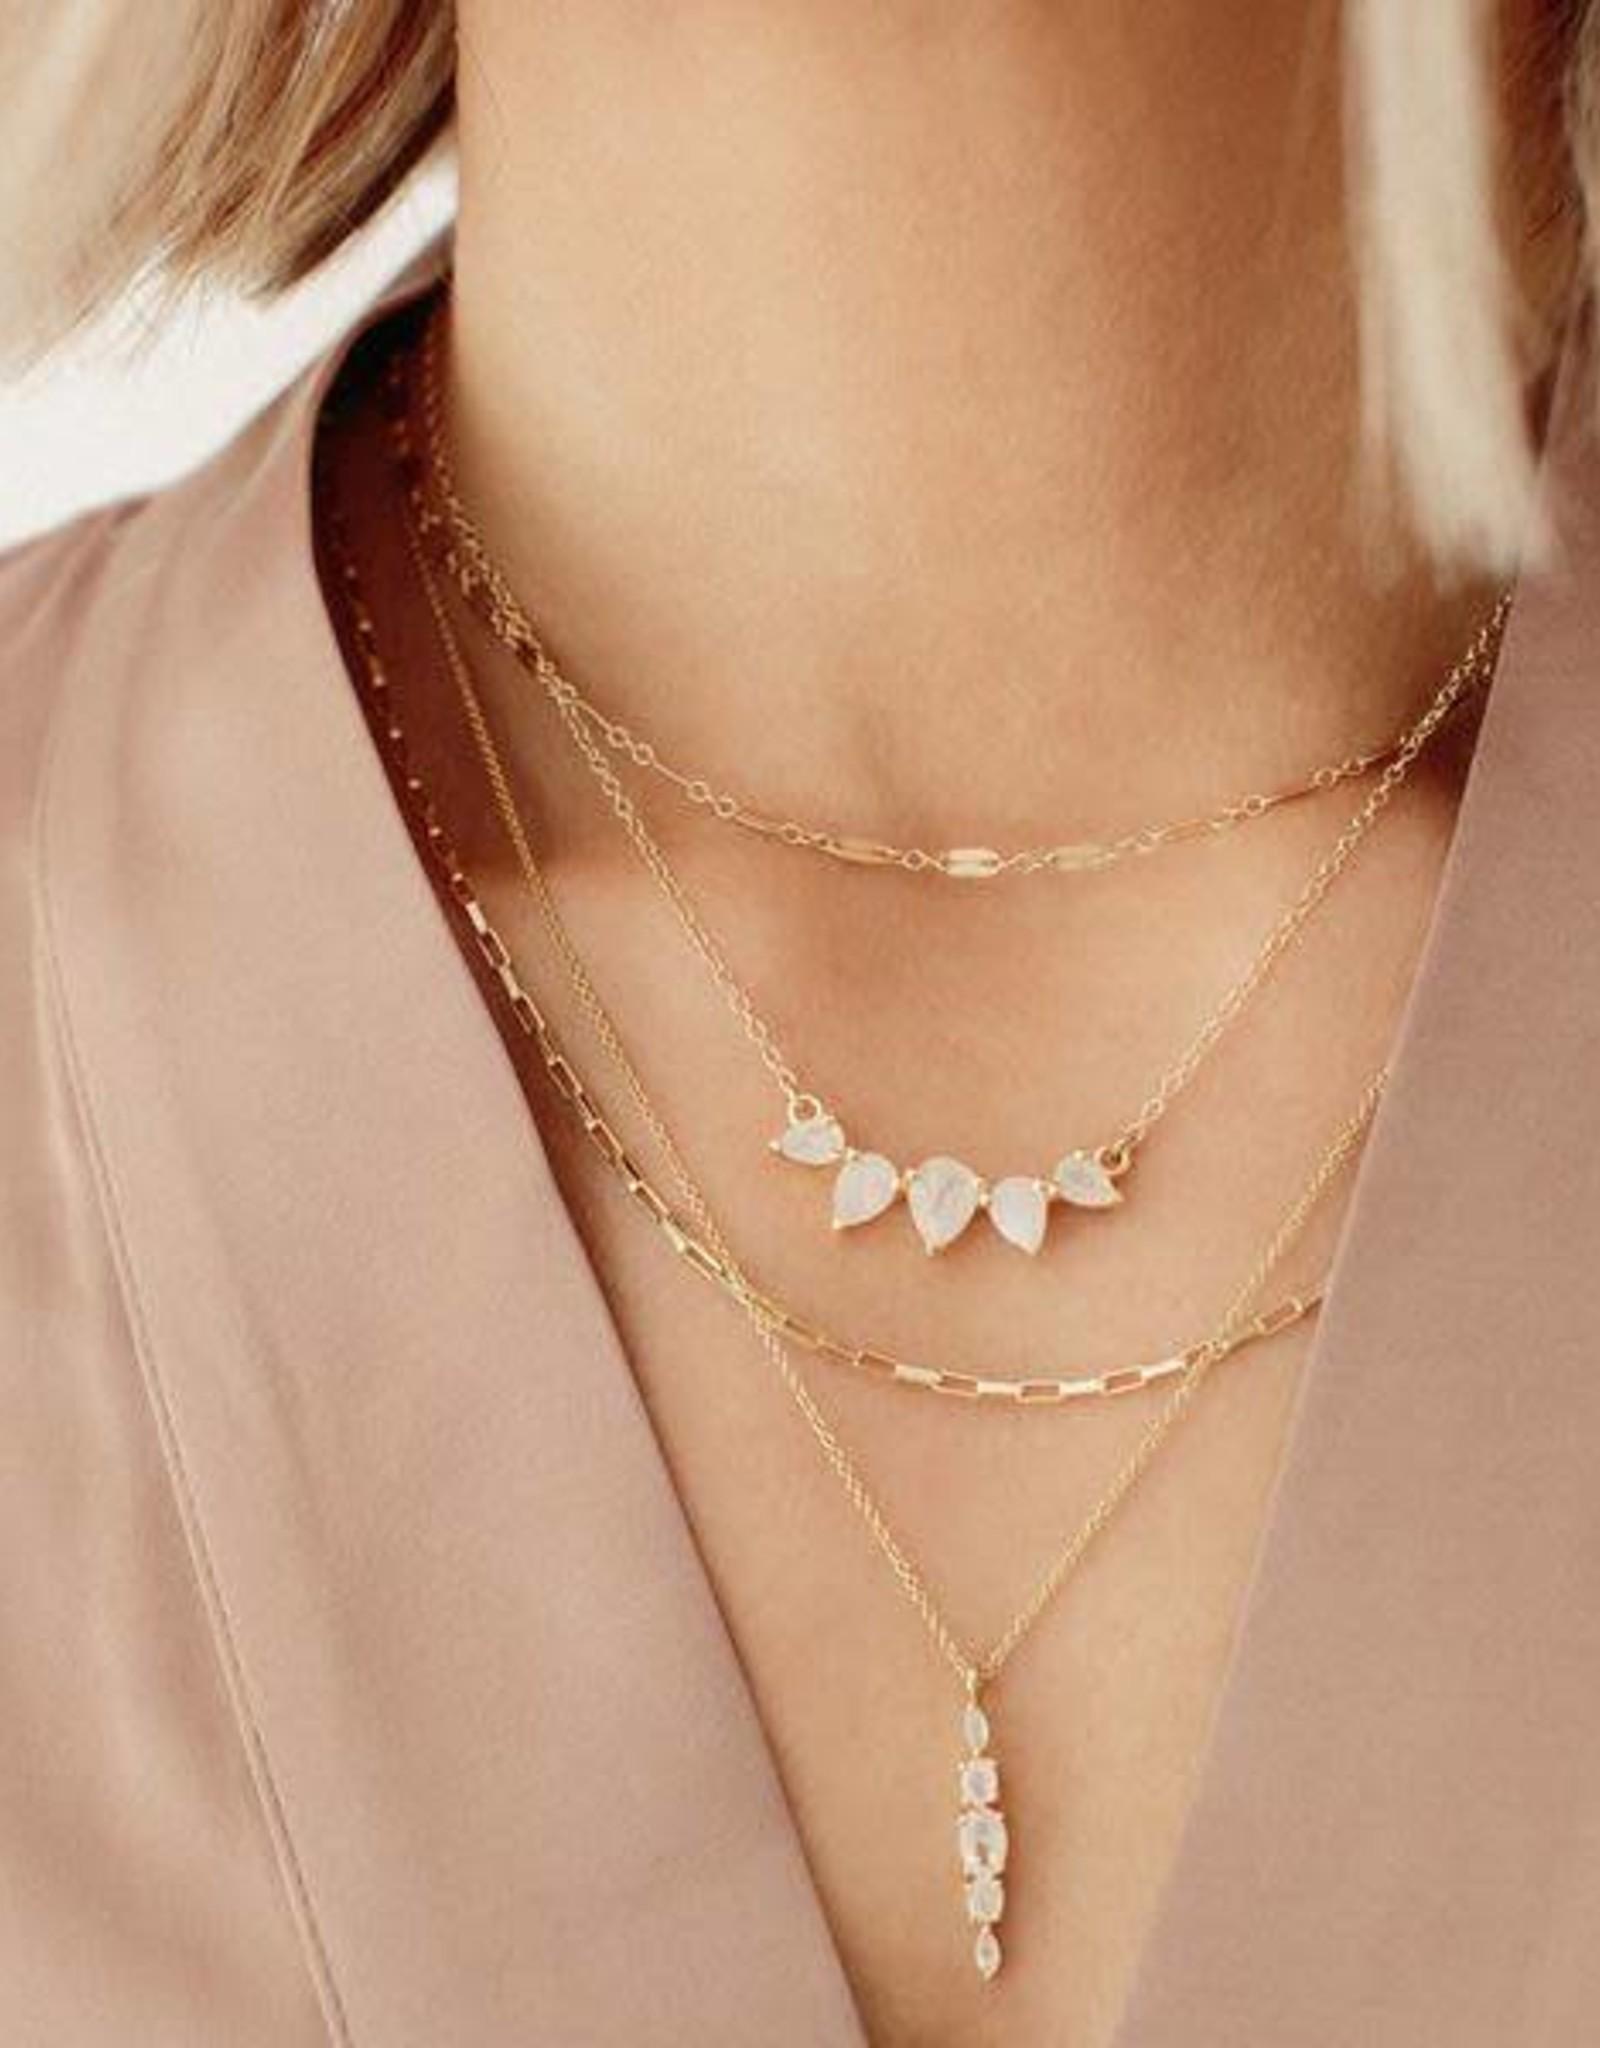 LEAH ALEXANDRA SUNNY necklace, MOONSTONE, 14k gold